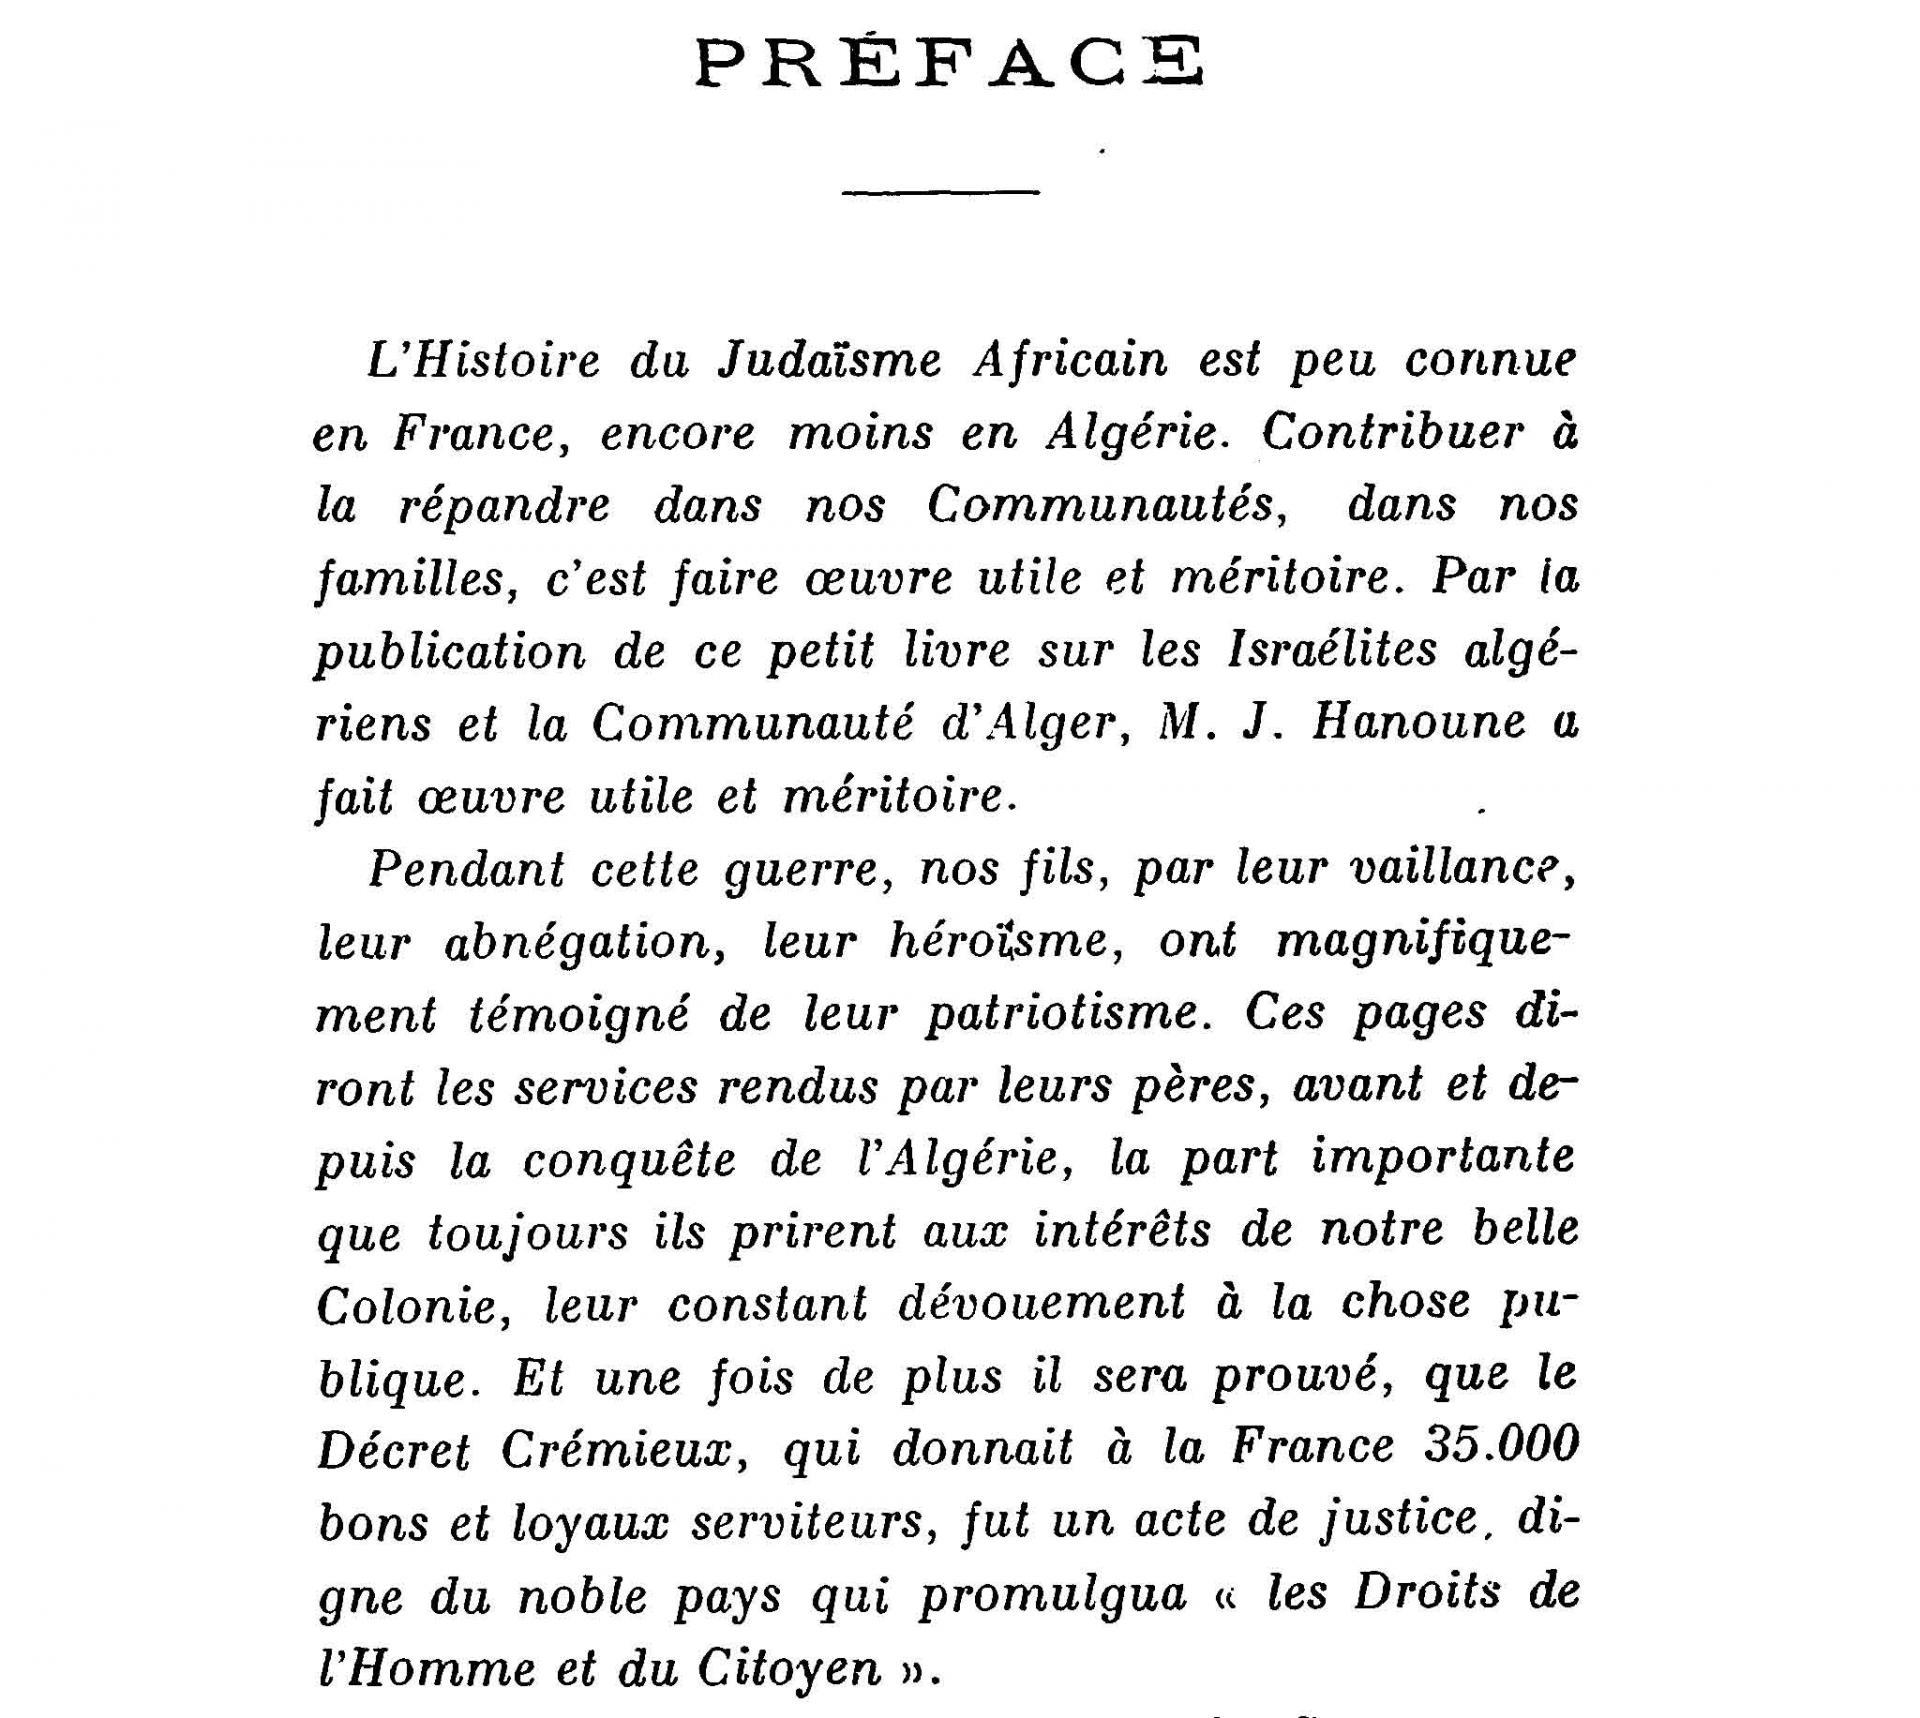 Preface grand rabbin fridman